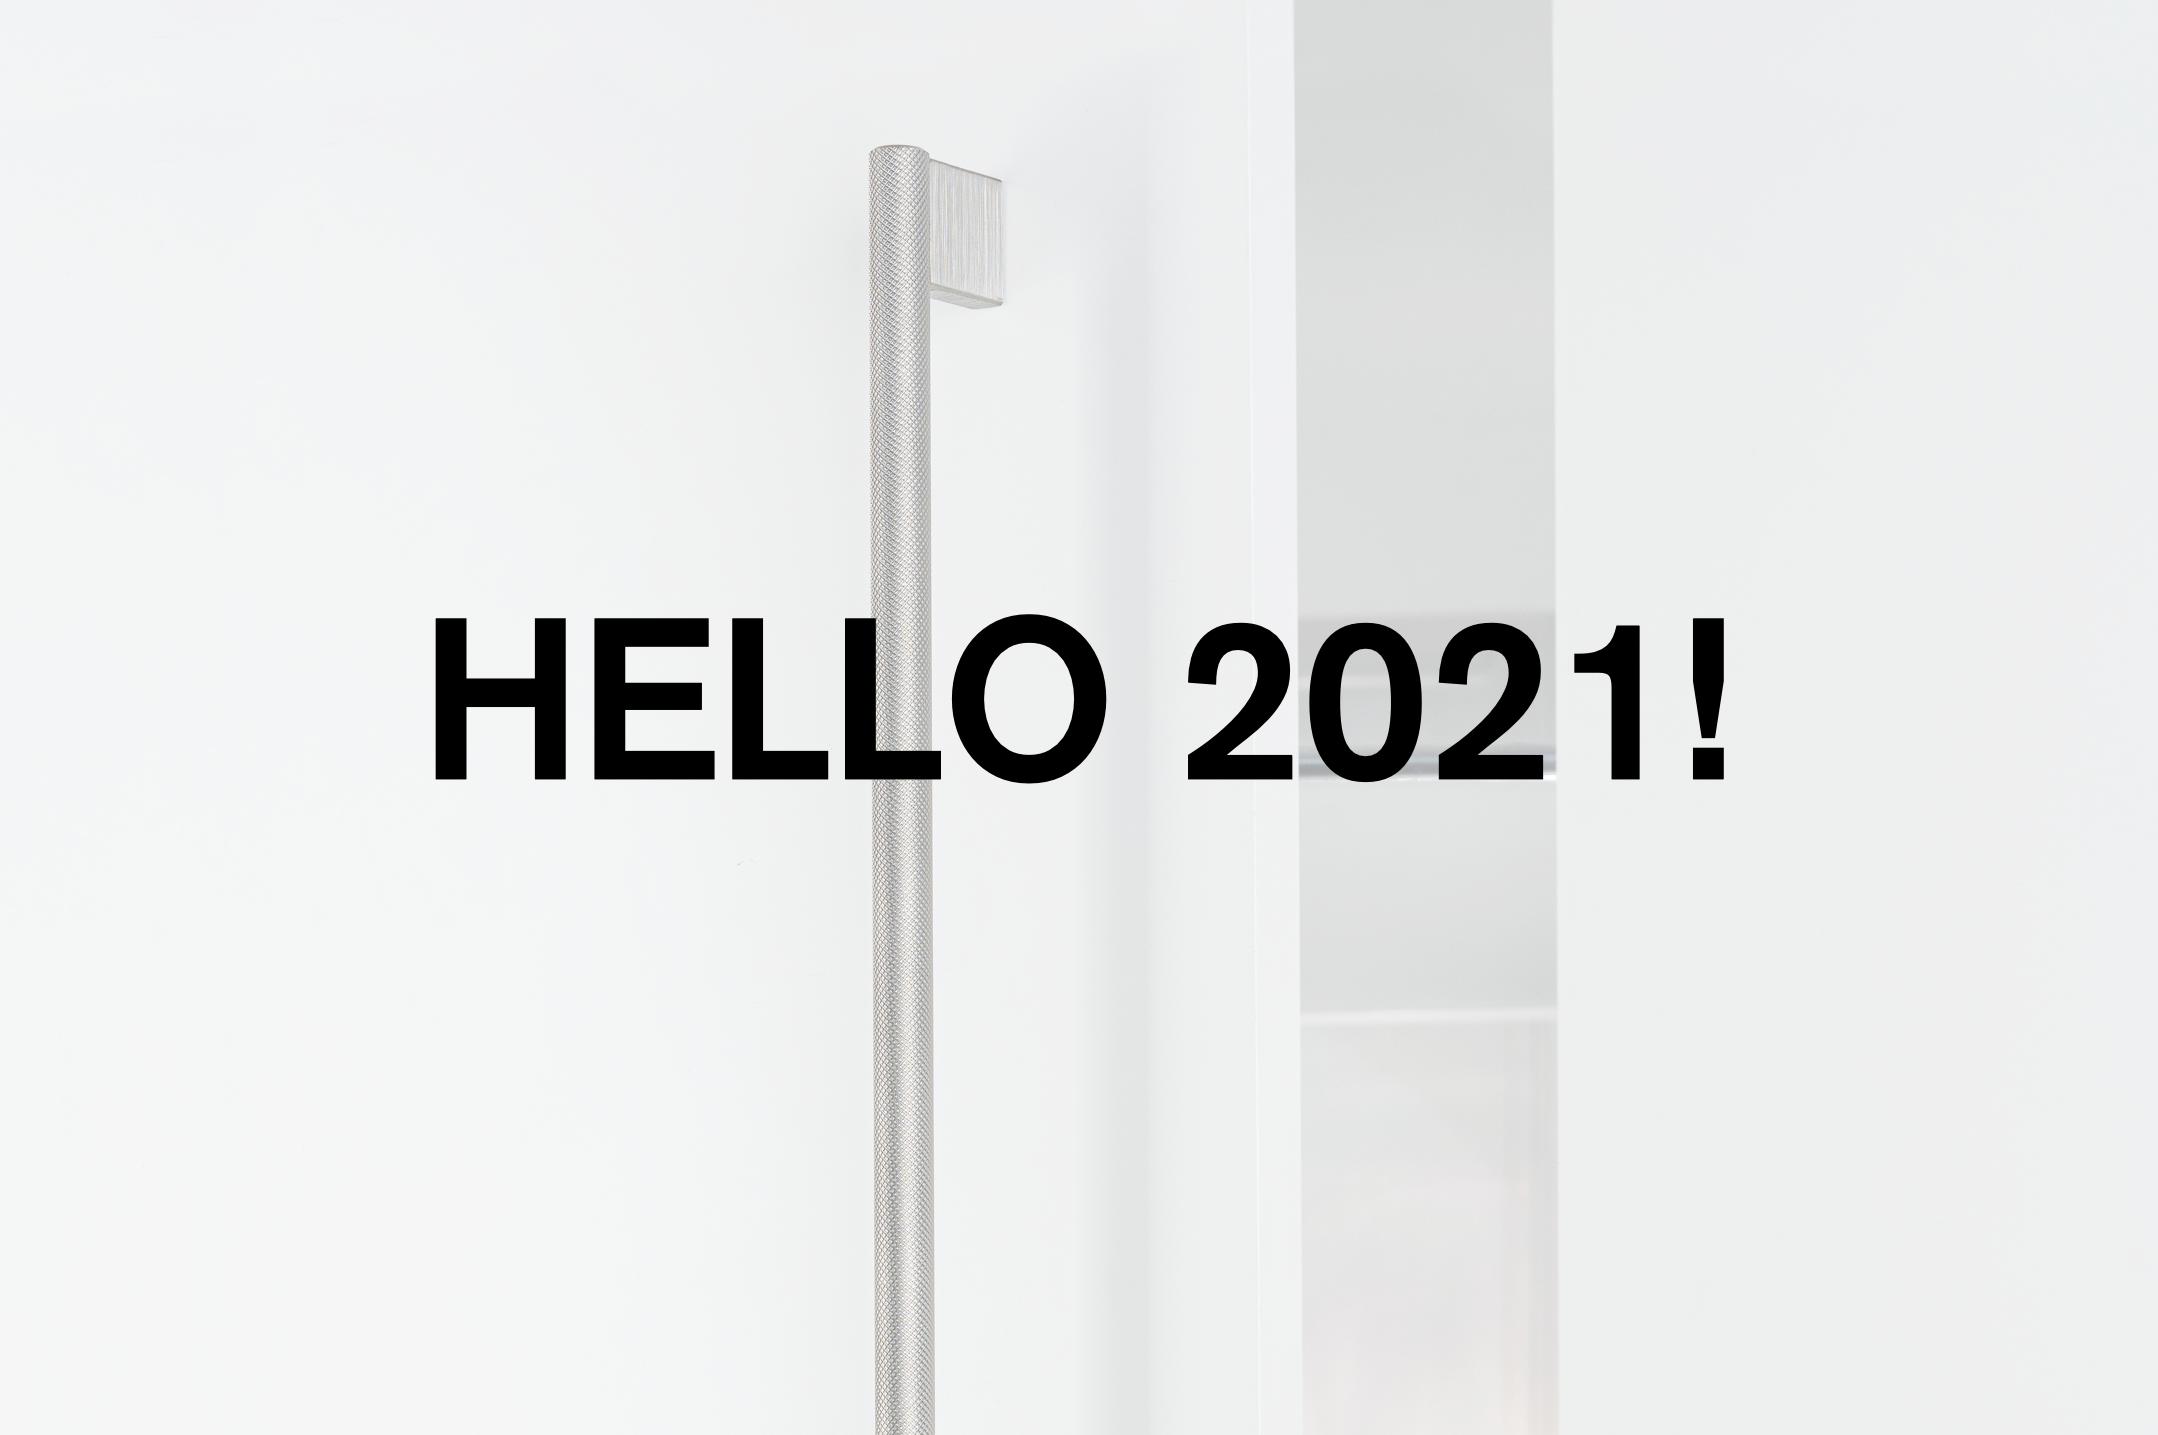 Happy new year 2021 Feliz ano 2021 hello 2021 Viefe